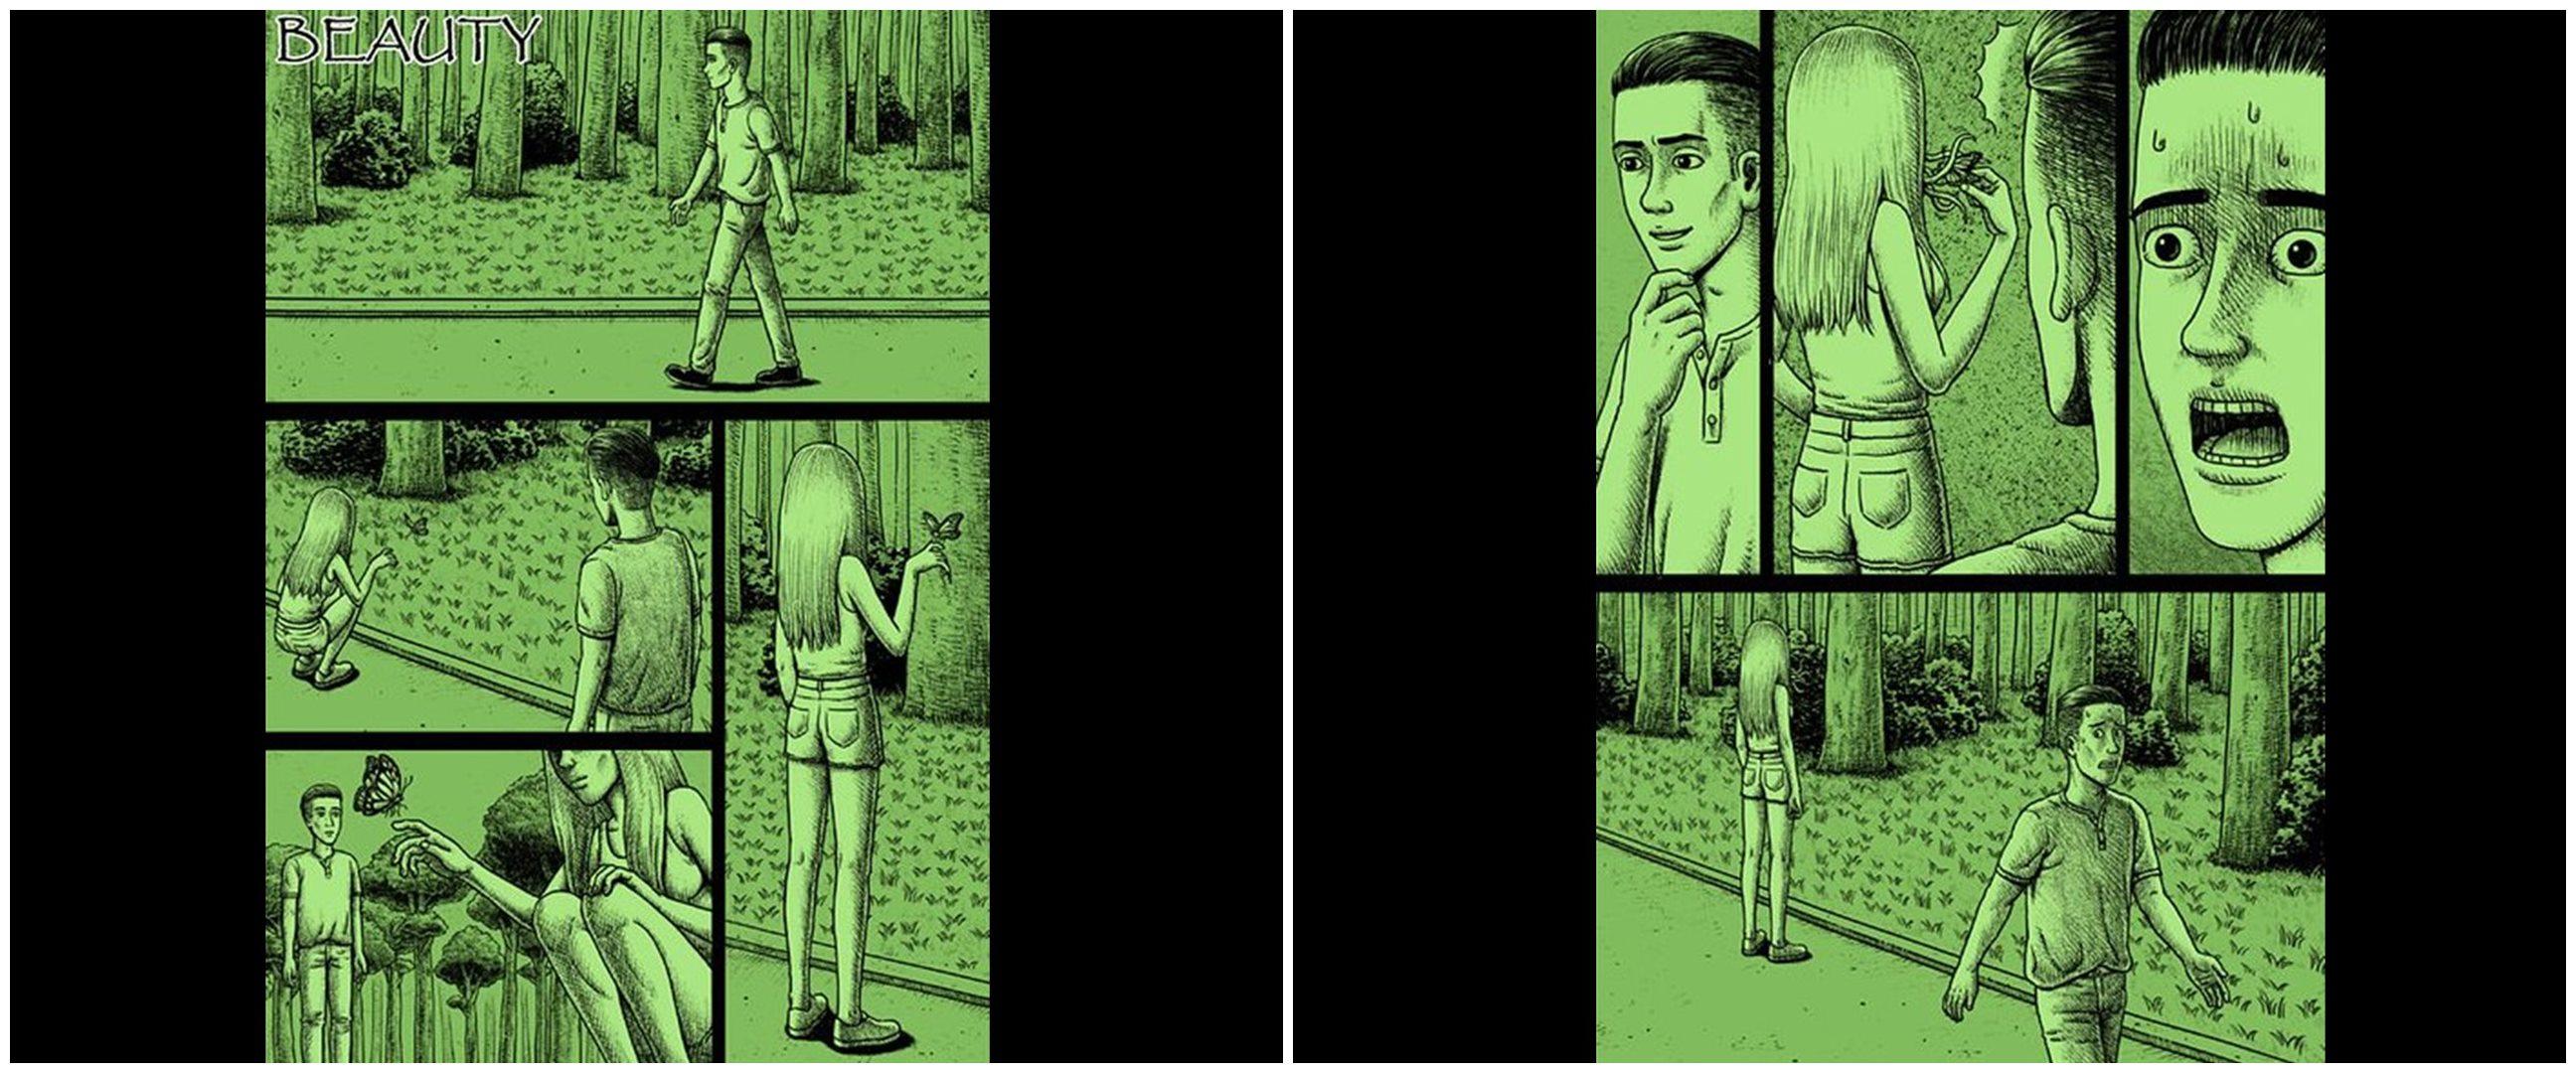 10 Komik strip tema horor ini endingnya bikin bergidik